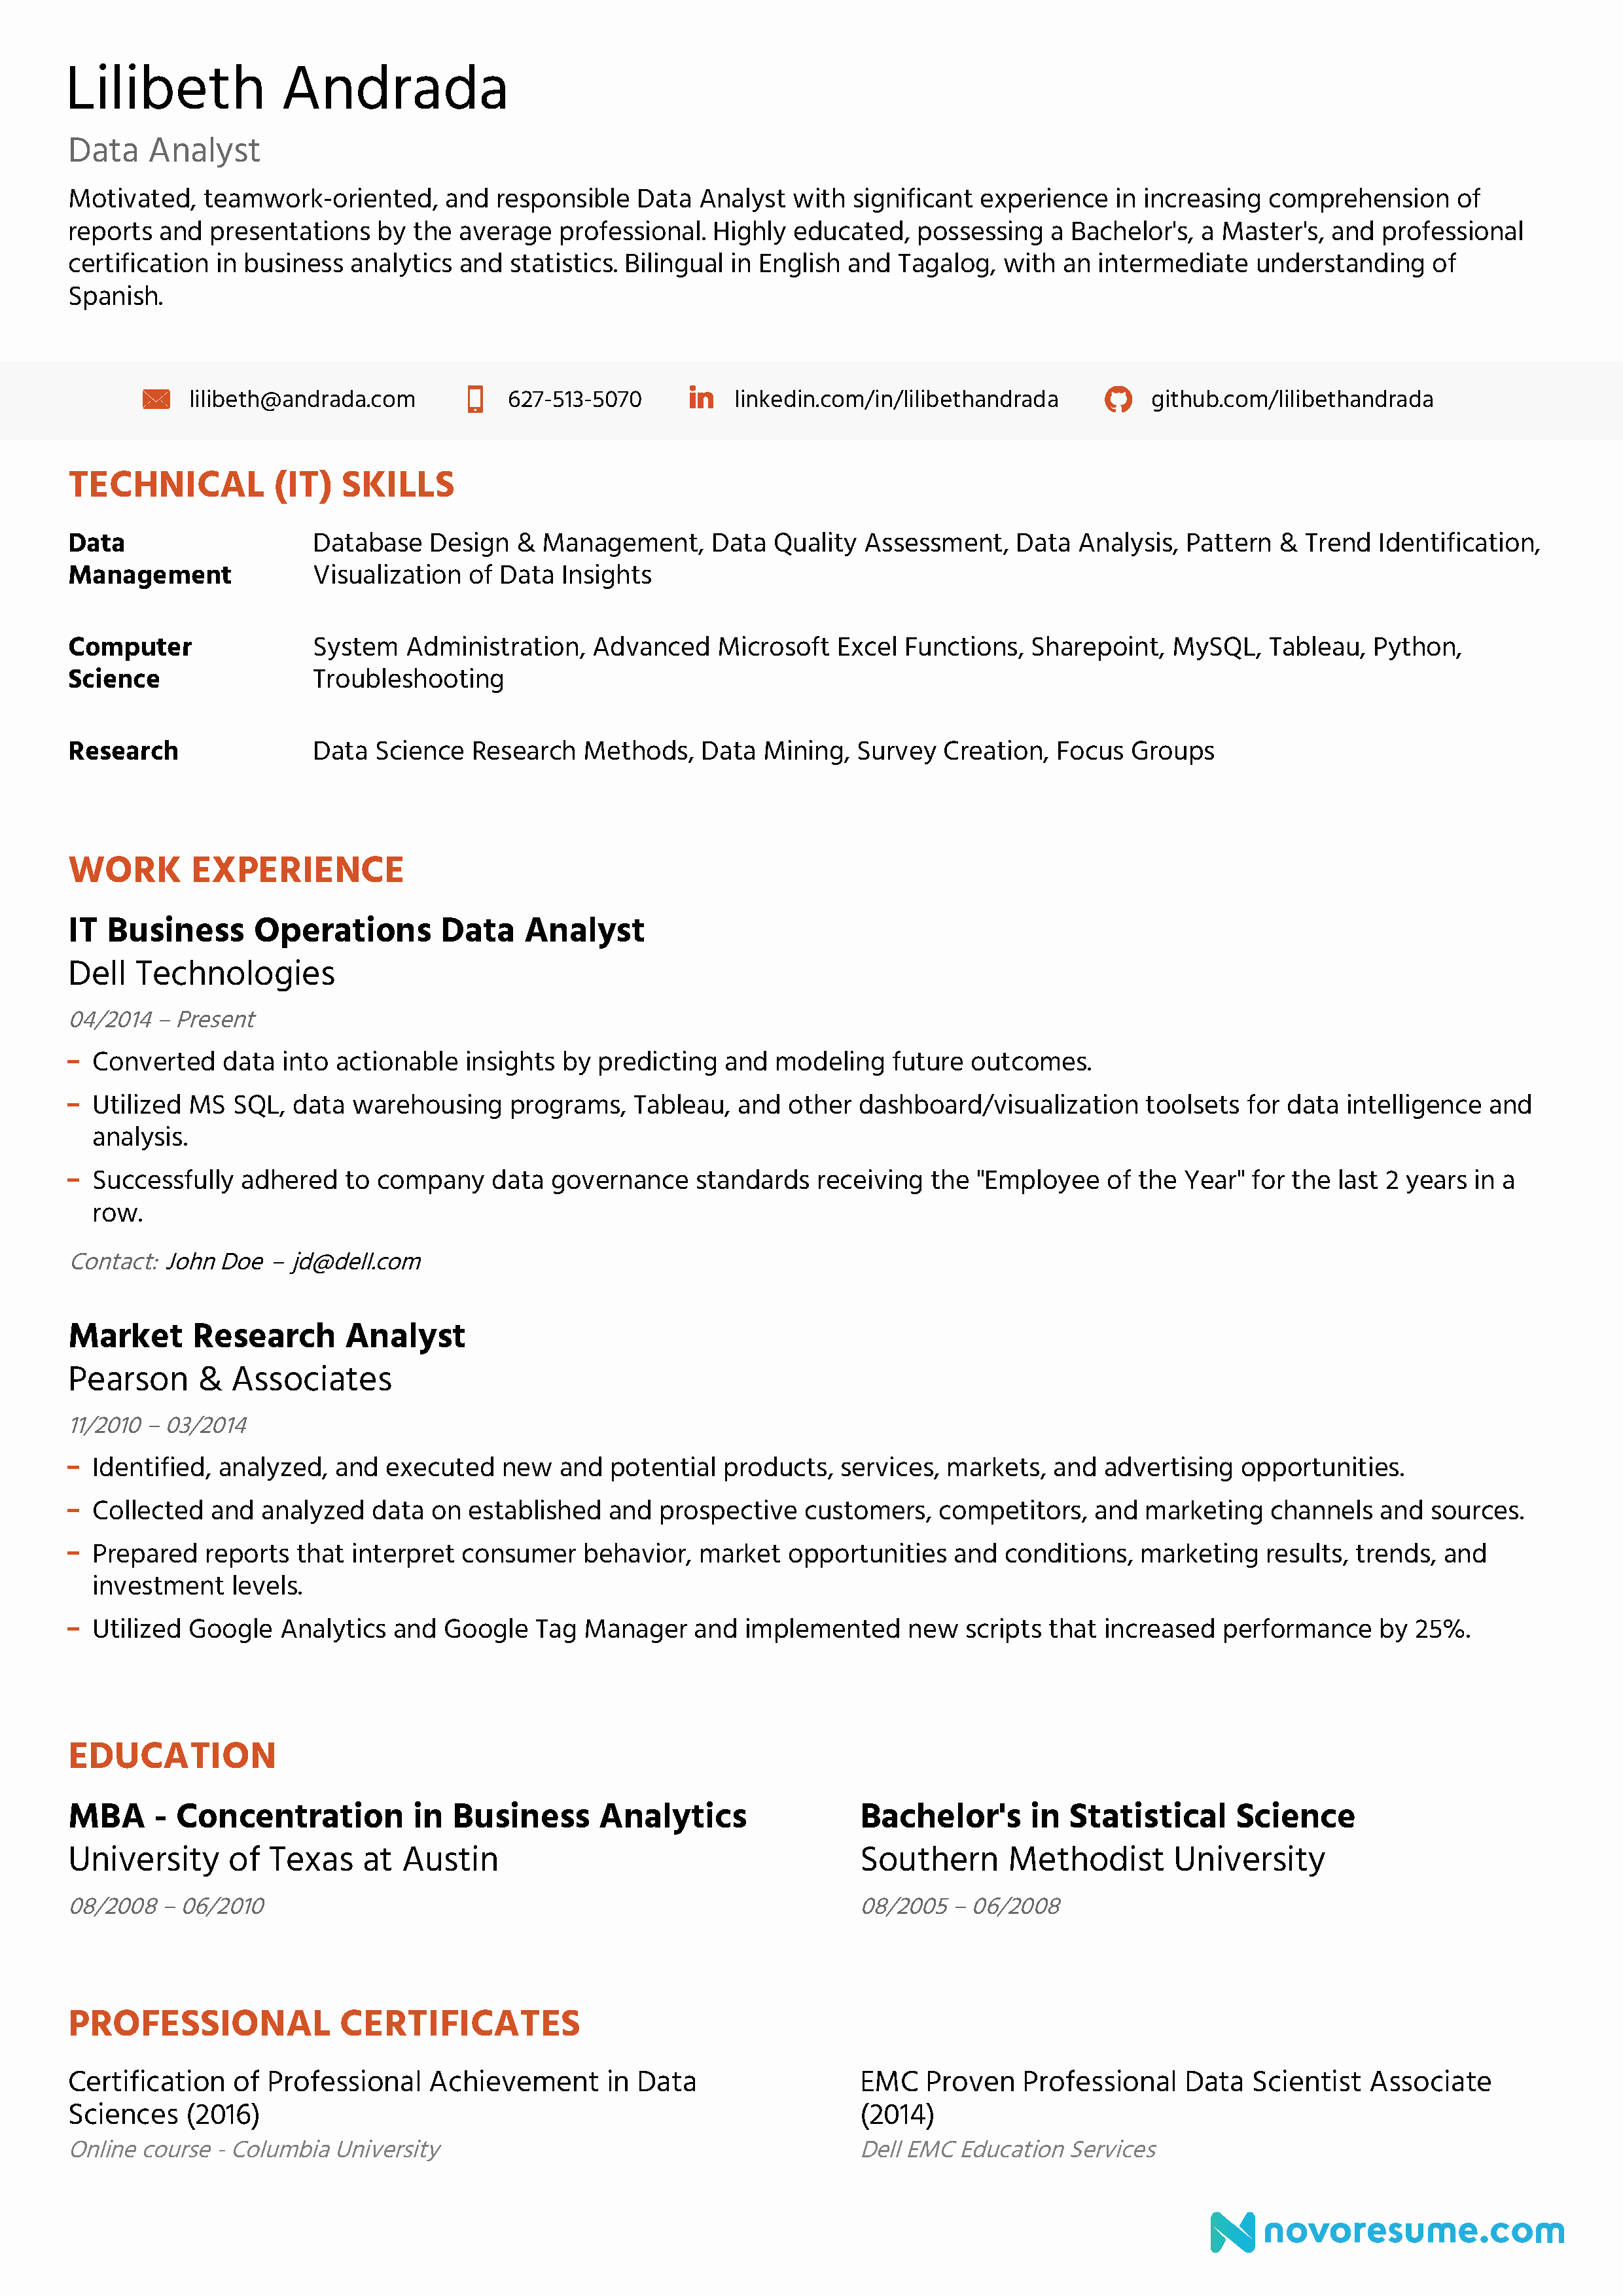 Data Analyst Resume Entry Level Elegant Data Analyst Resume [2019] Guide & Examples